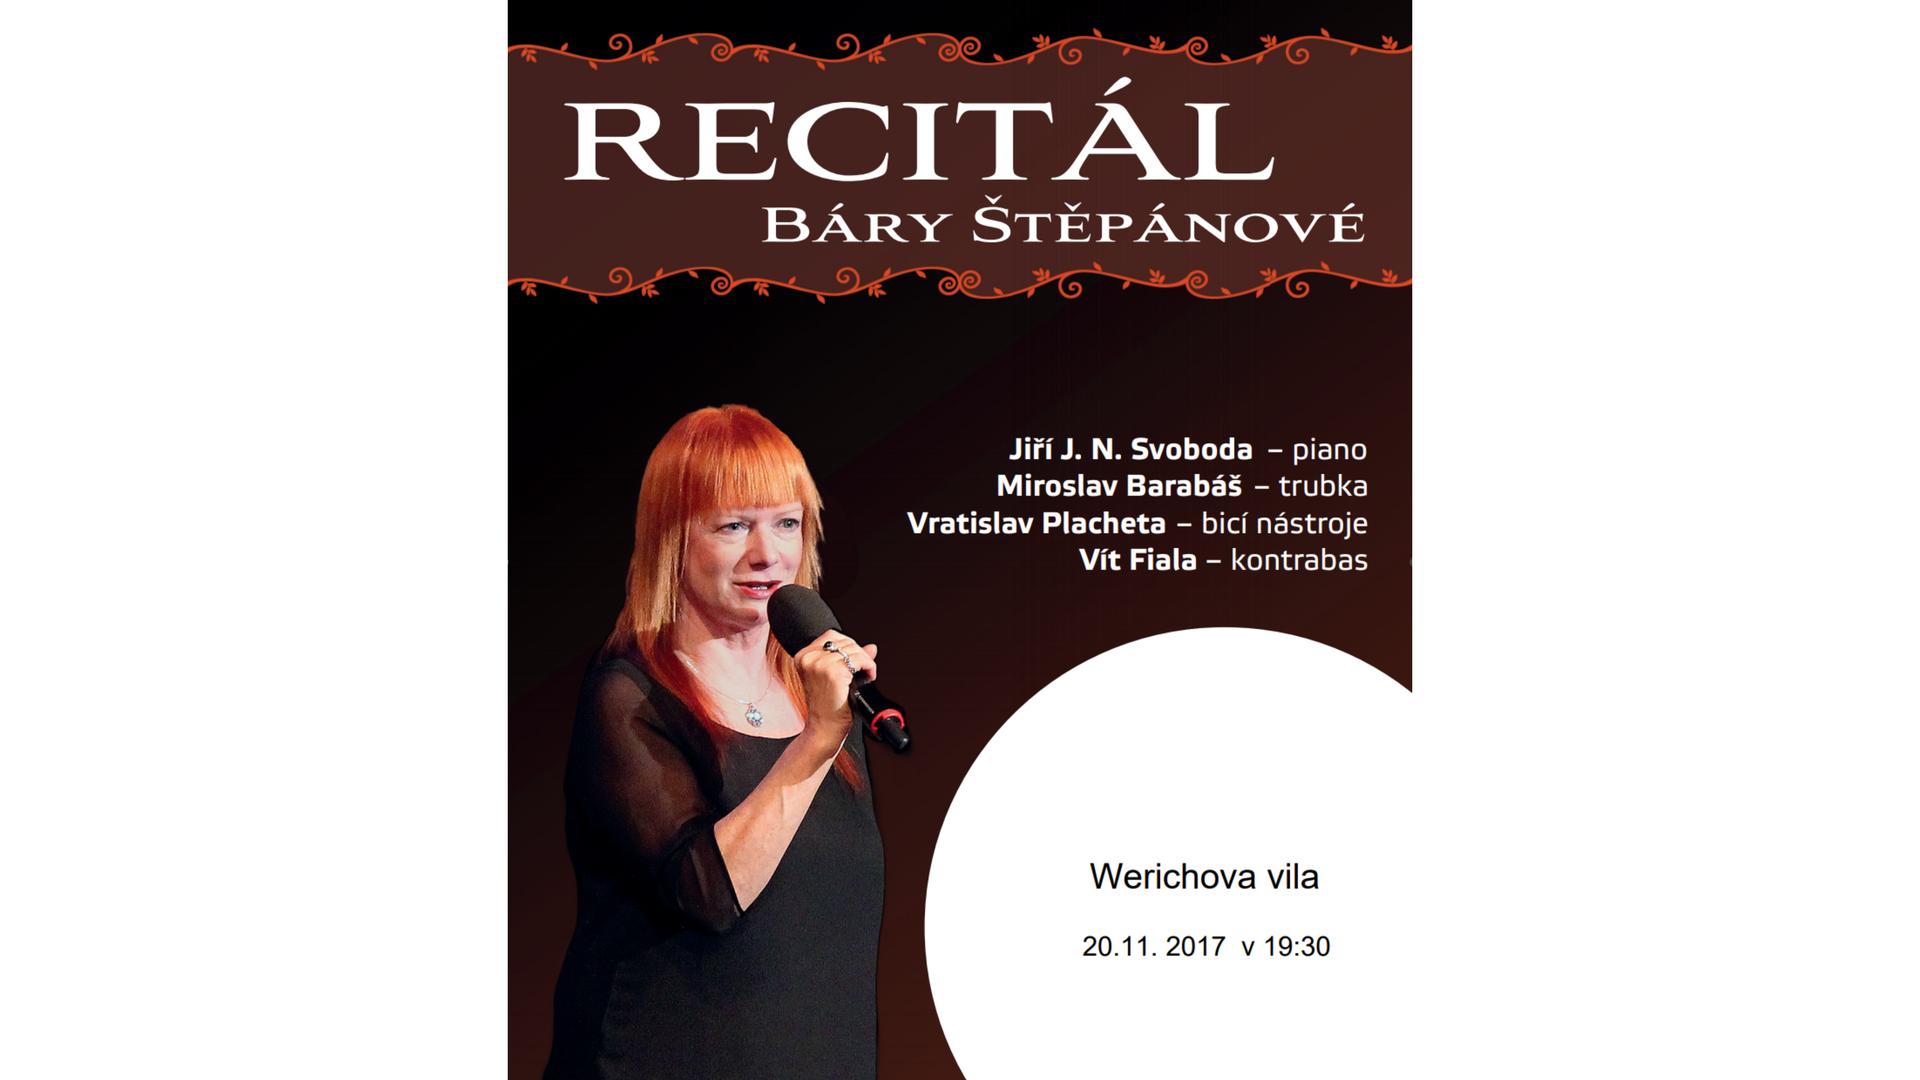 bára štěpánová recital werichova vila kampa